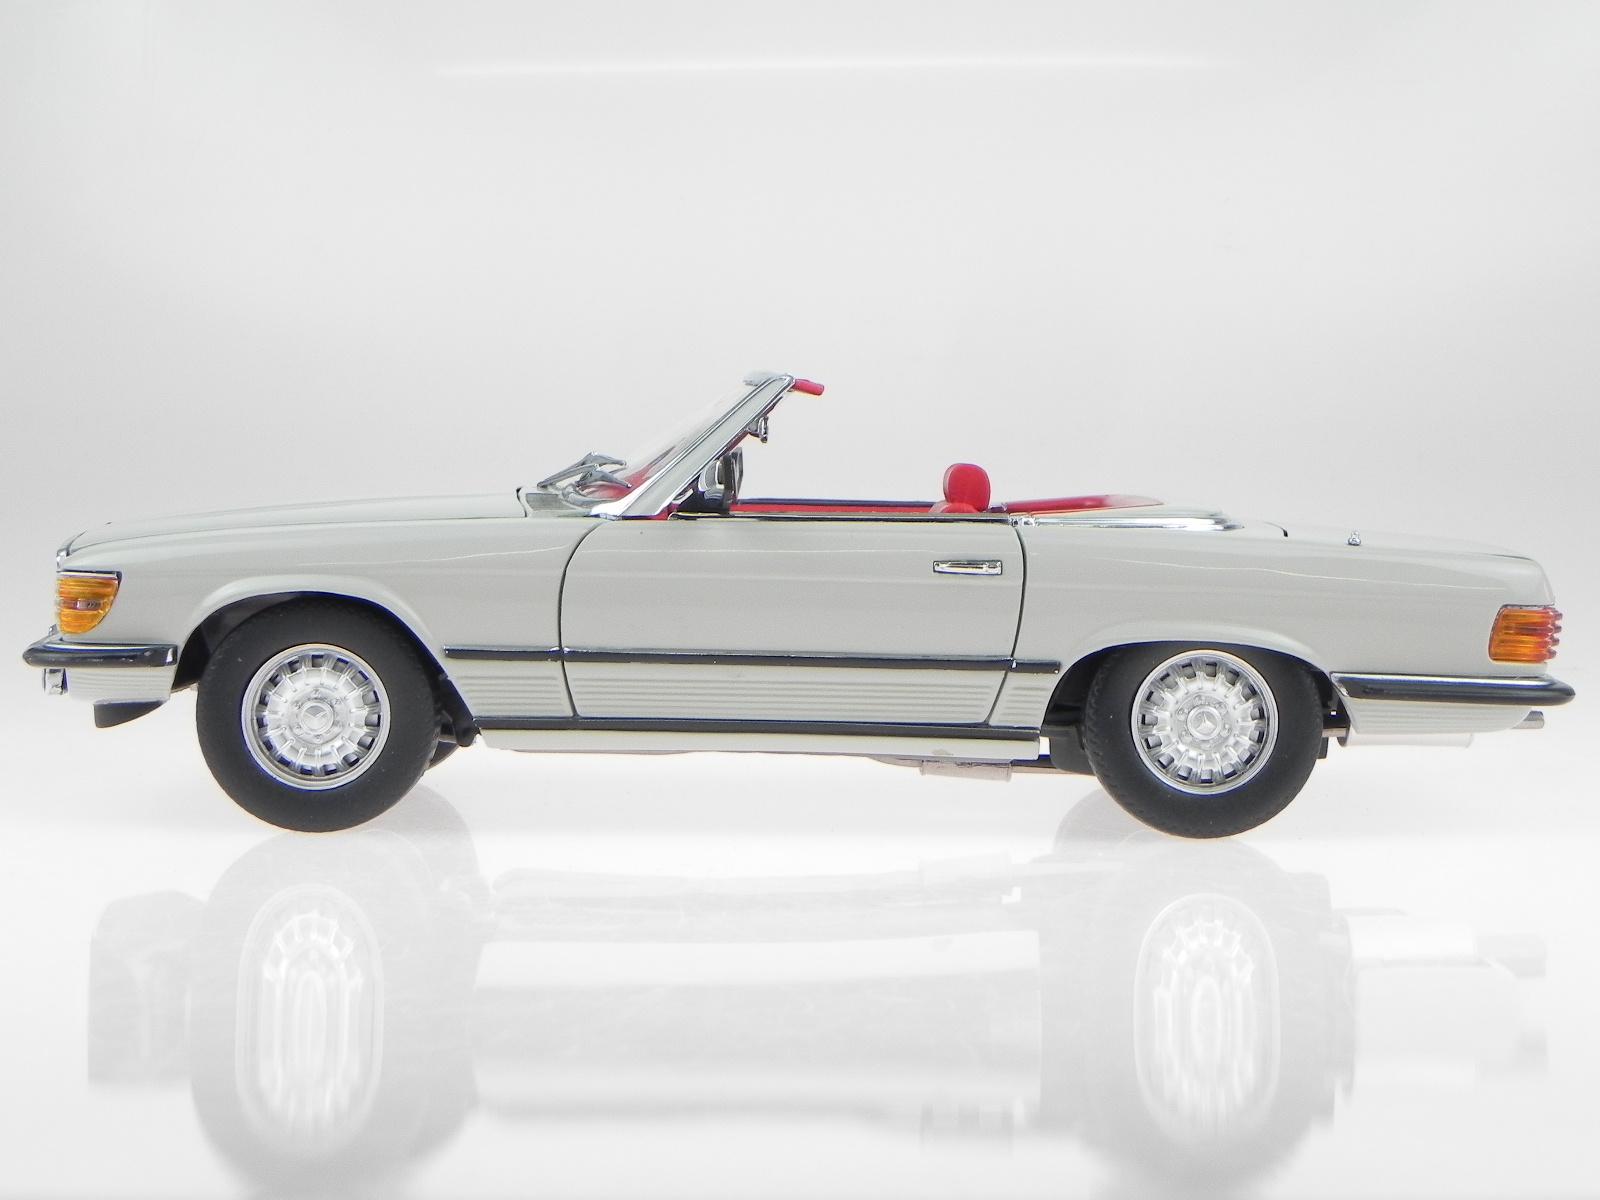 mercedes r107 350 sl 1977 pastell grau modellauto 4603. Black Bedroom Furniture Sets. Home Design Ideas